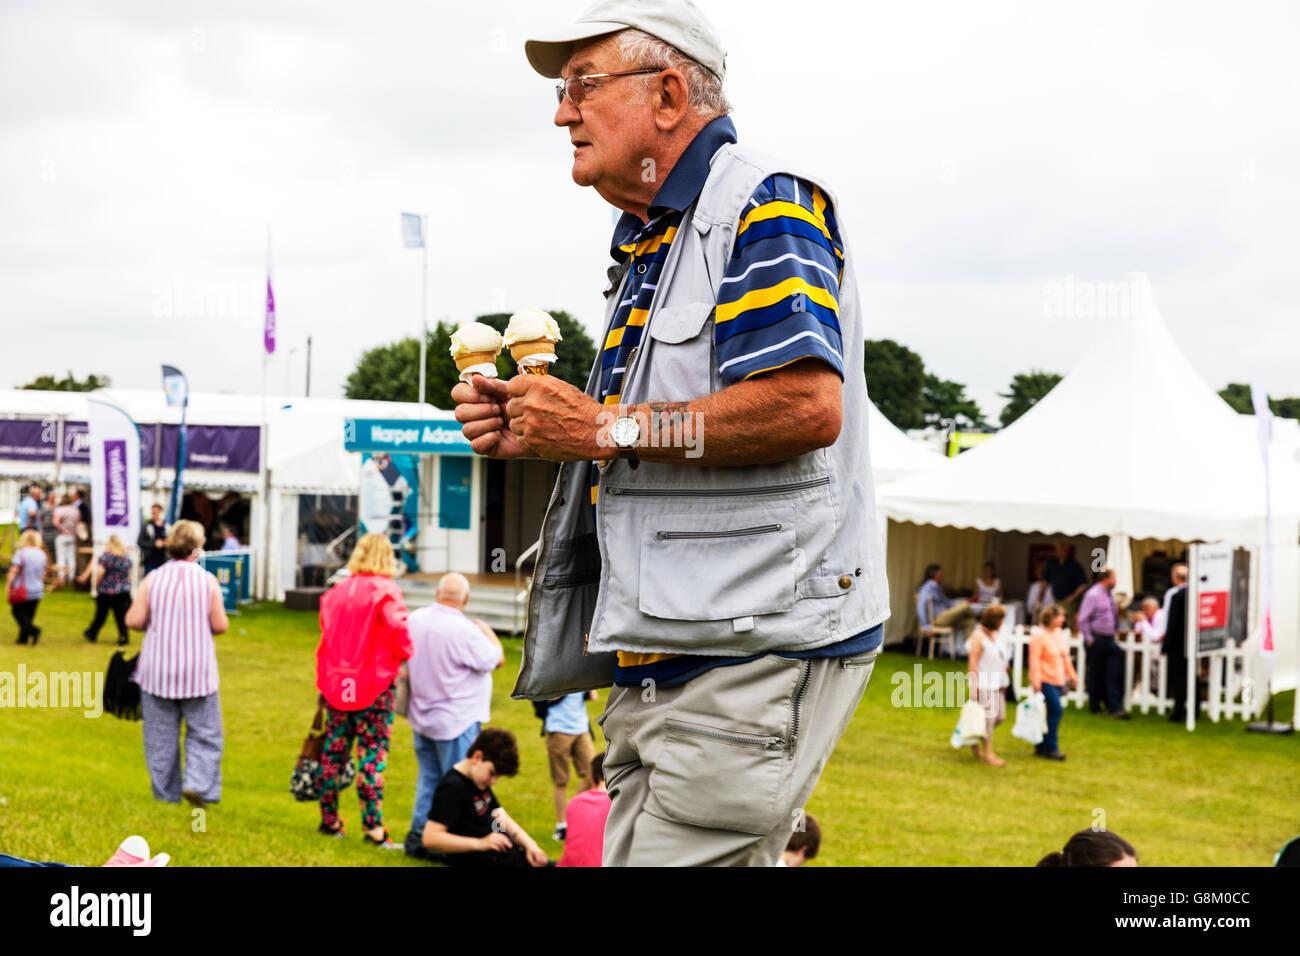 Man walking with ice creams icecreams cornets to family UK England GB - Stock Image